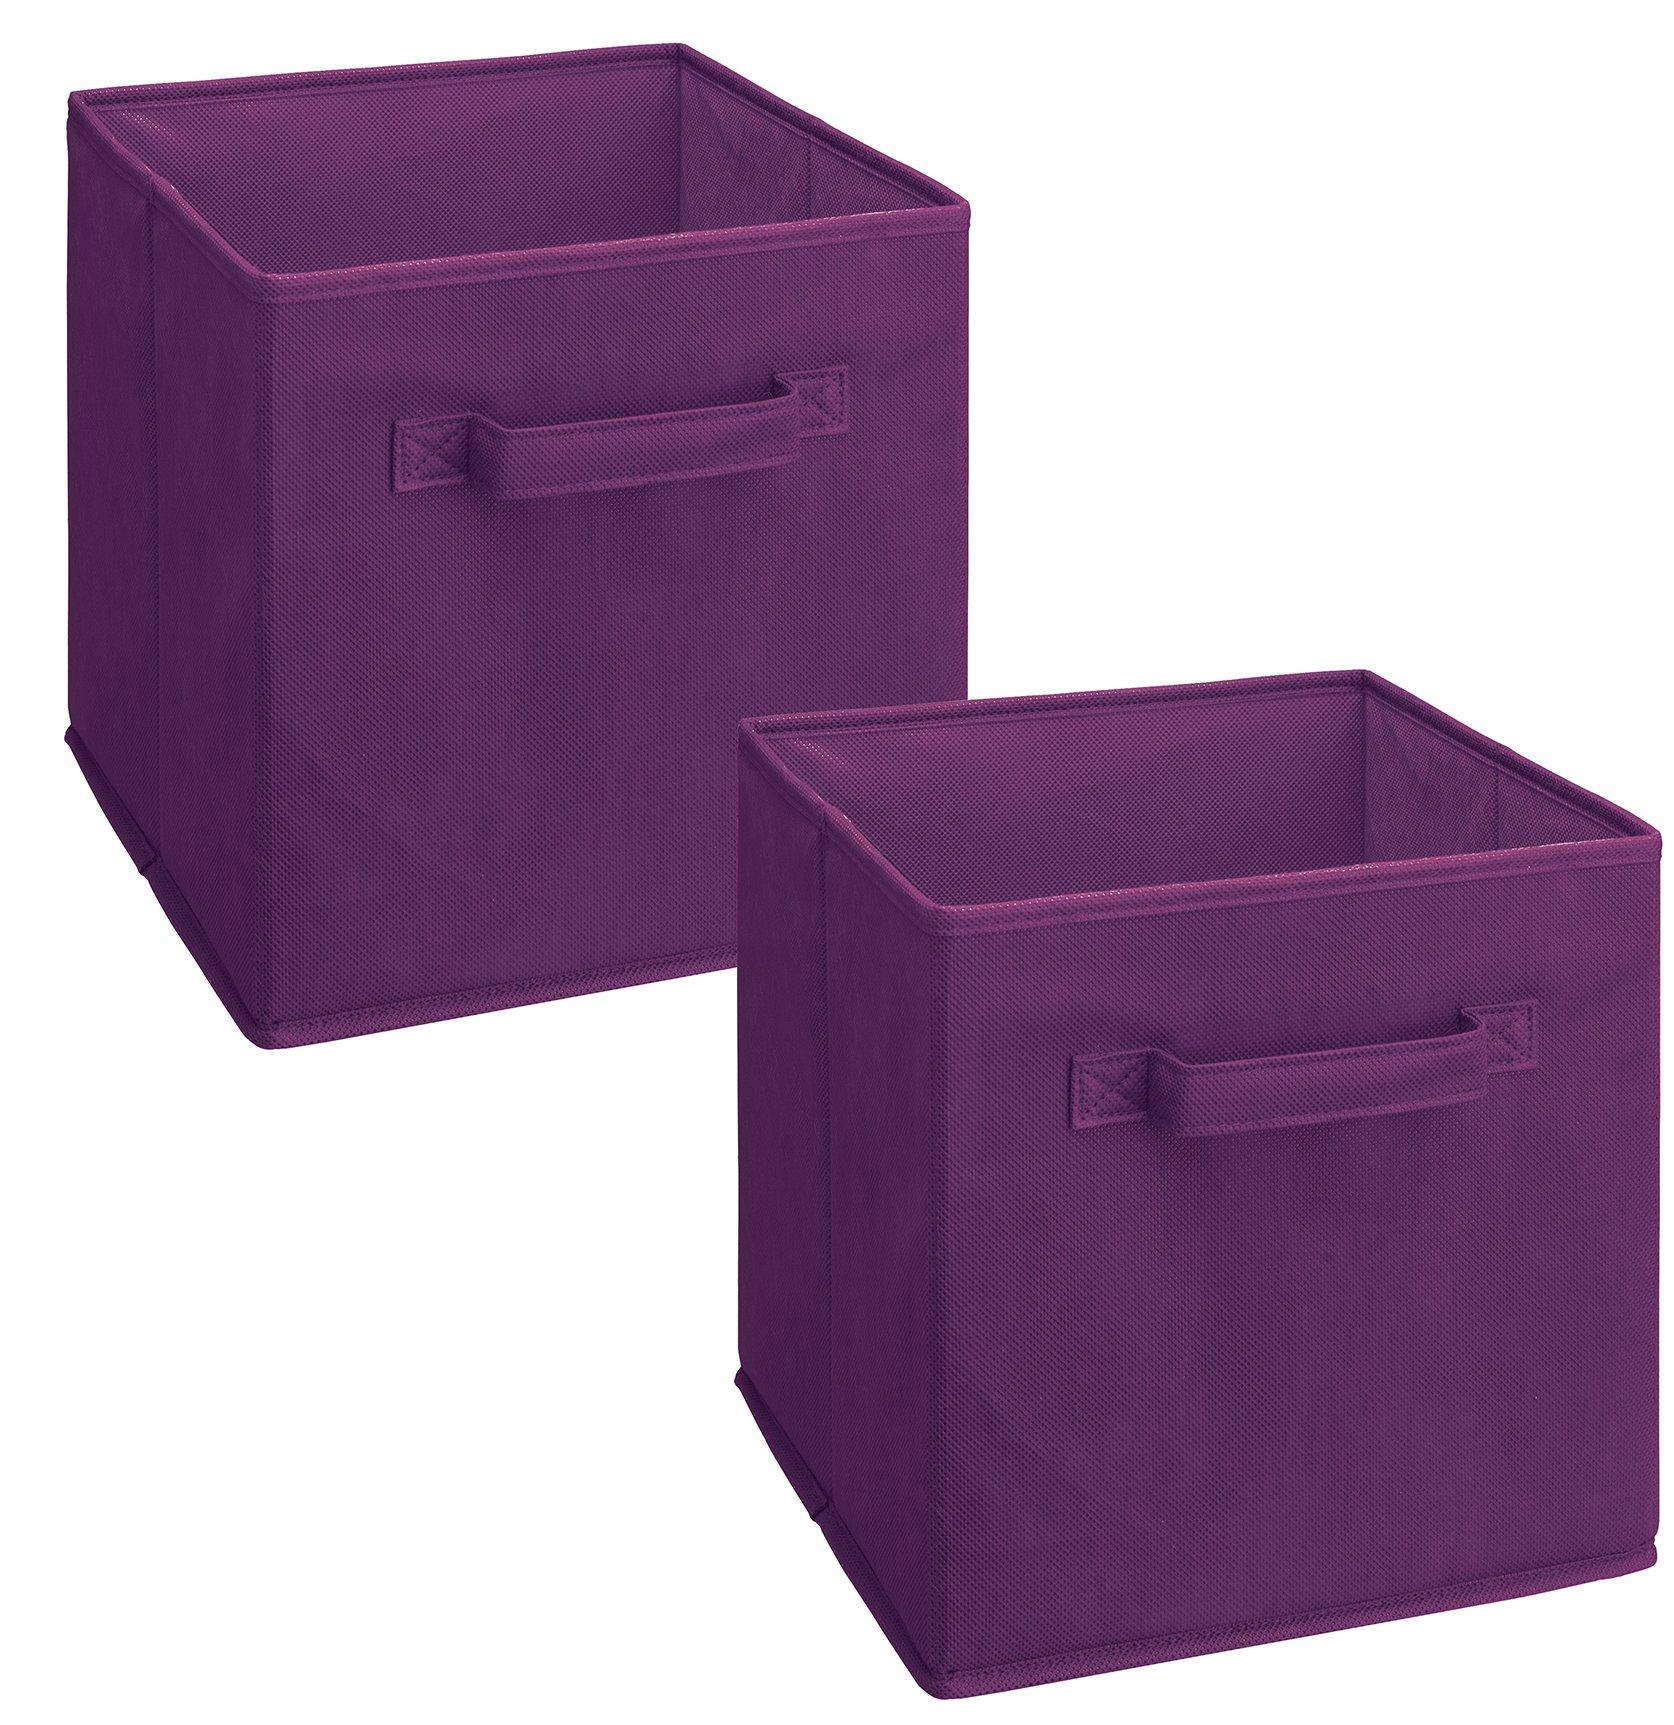 ClosetMaid 11469 Cubeicals Fabric Drawer, Purple, 2-Pack